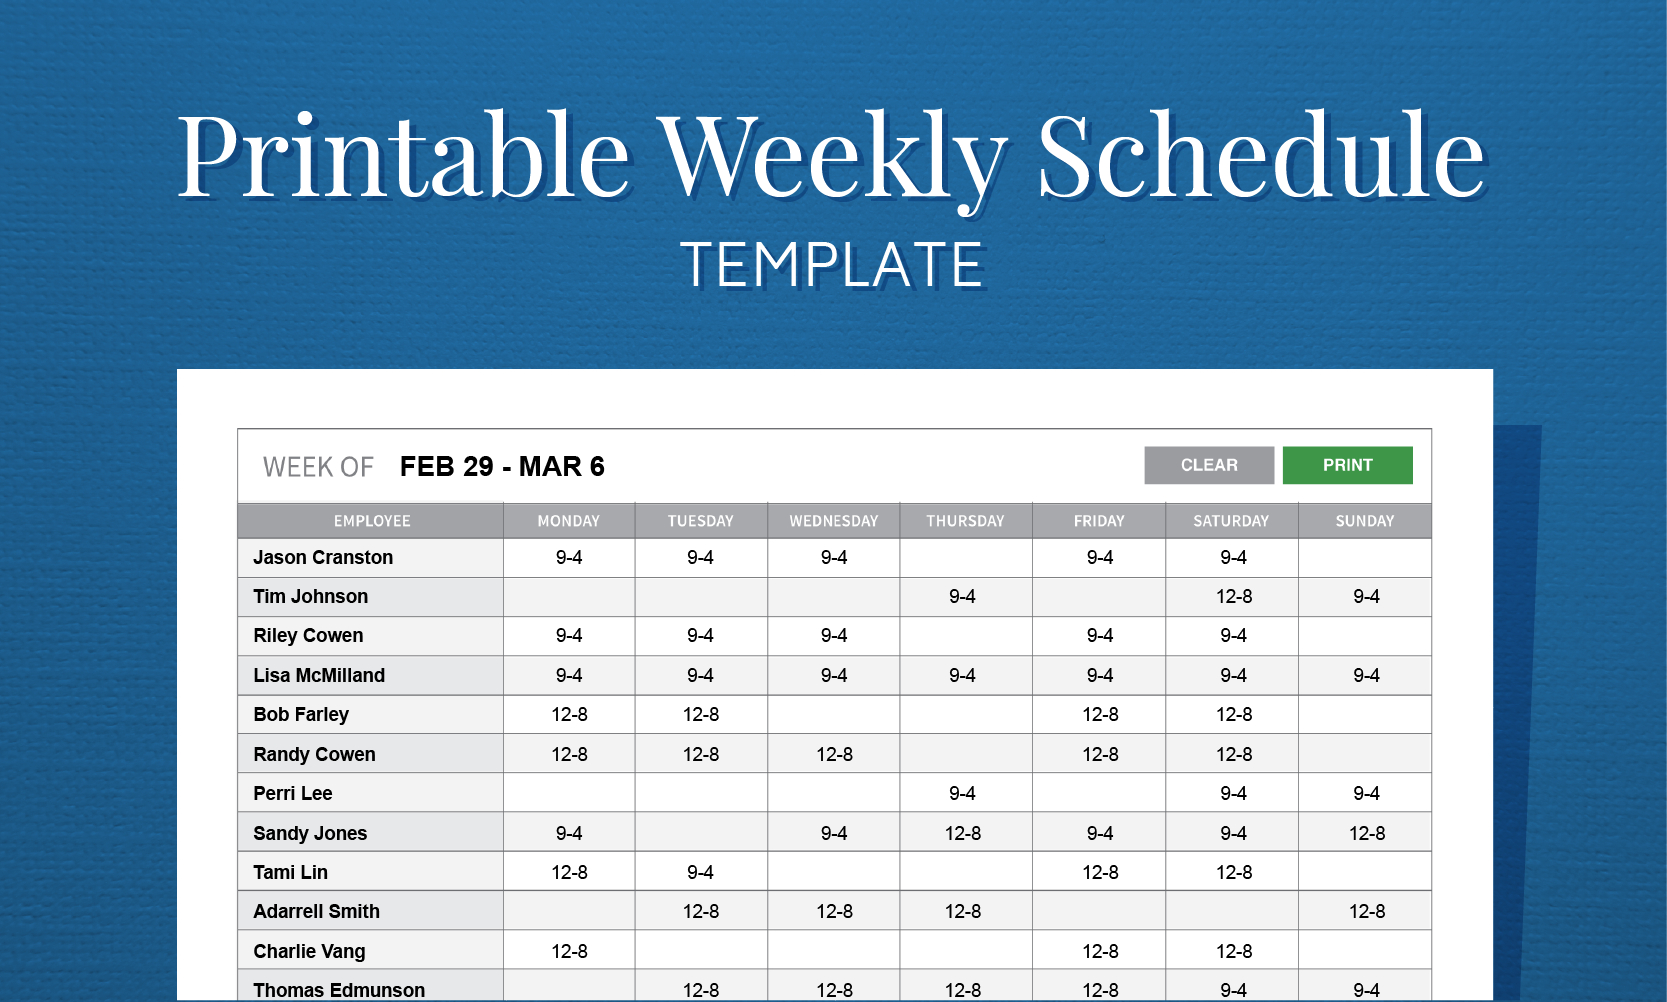 free printable weekly work schedule template for employee scheduling within employee weekly. Black Bedroom Furniture Sets. Home Design Ideas